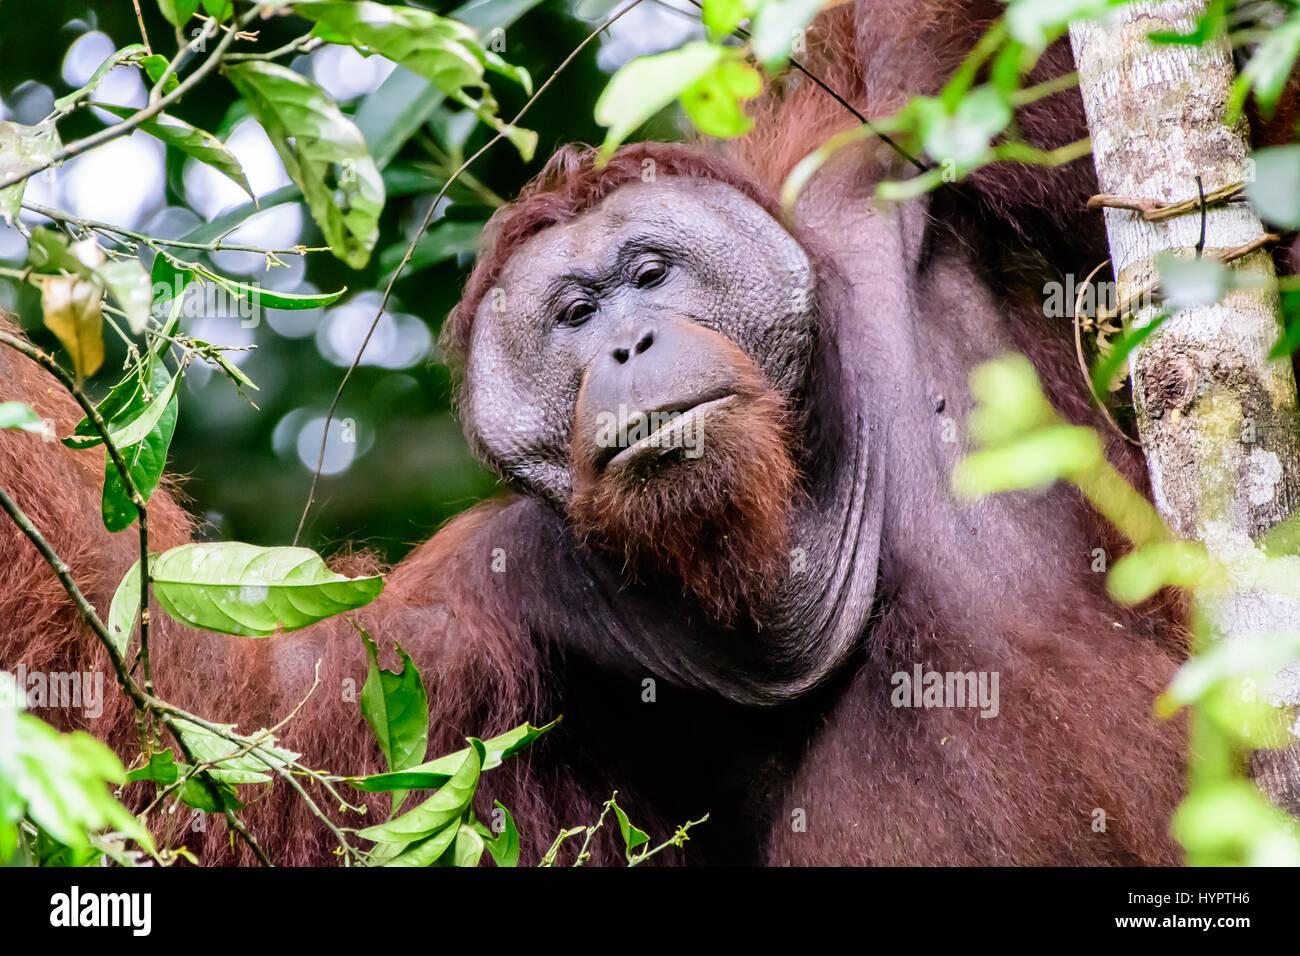 Inquisitive male flange orangutan - Stock Image